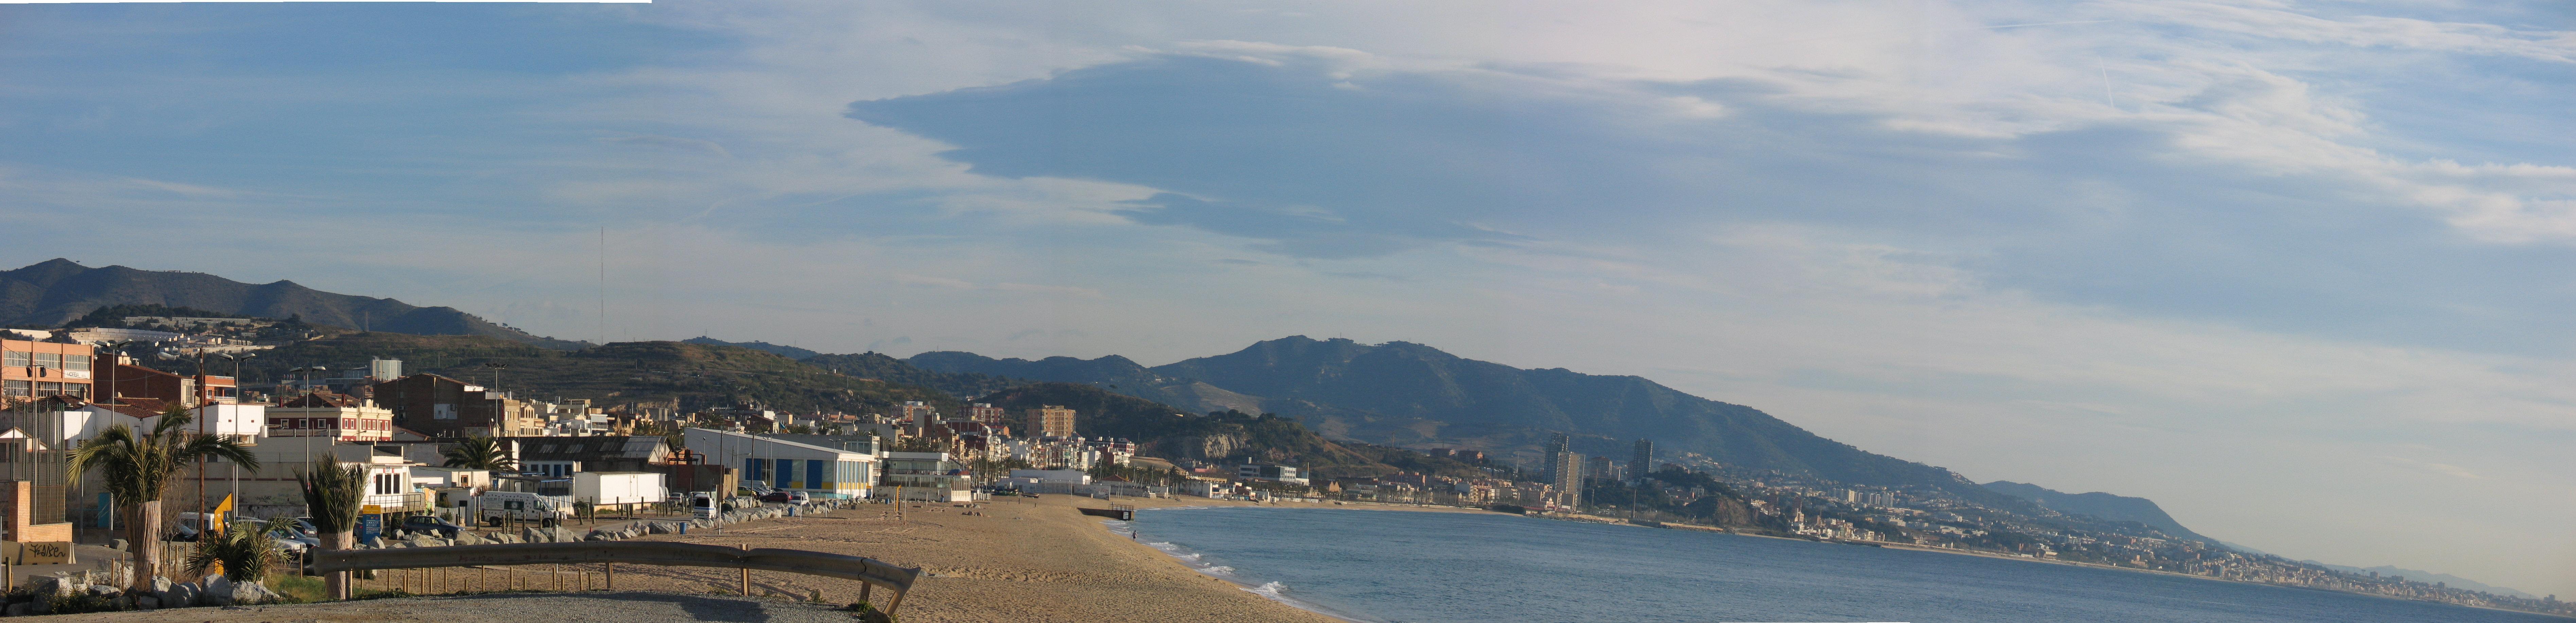 Playa Platja del Coco